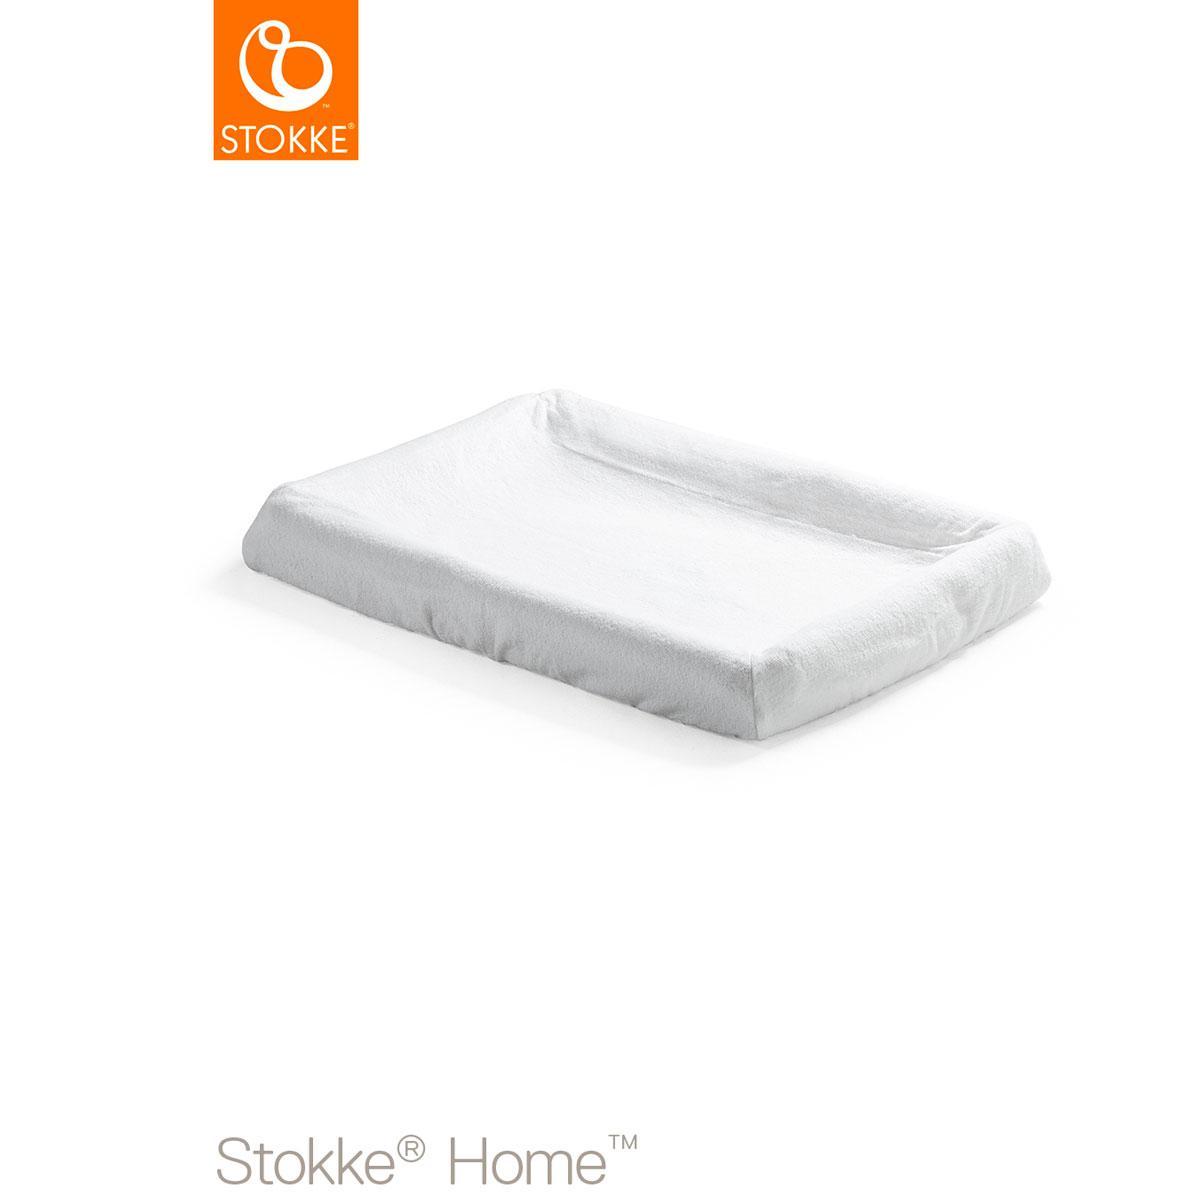 Funda colchón cambiador HOME Stokke blanco